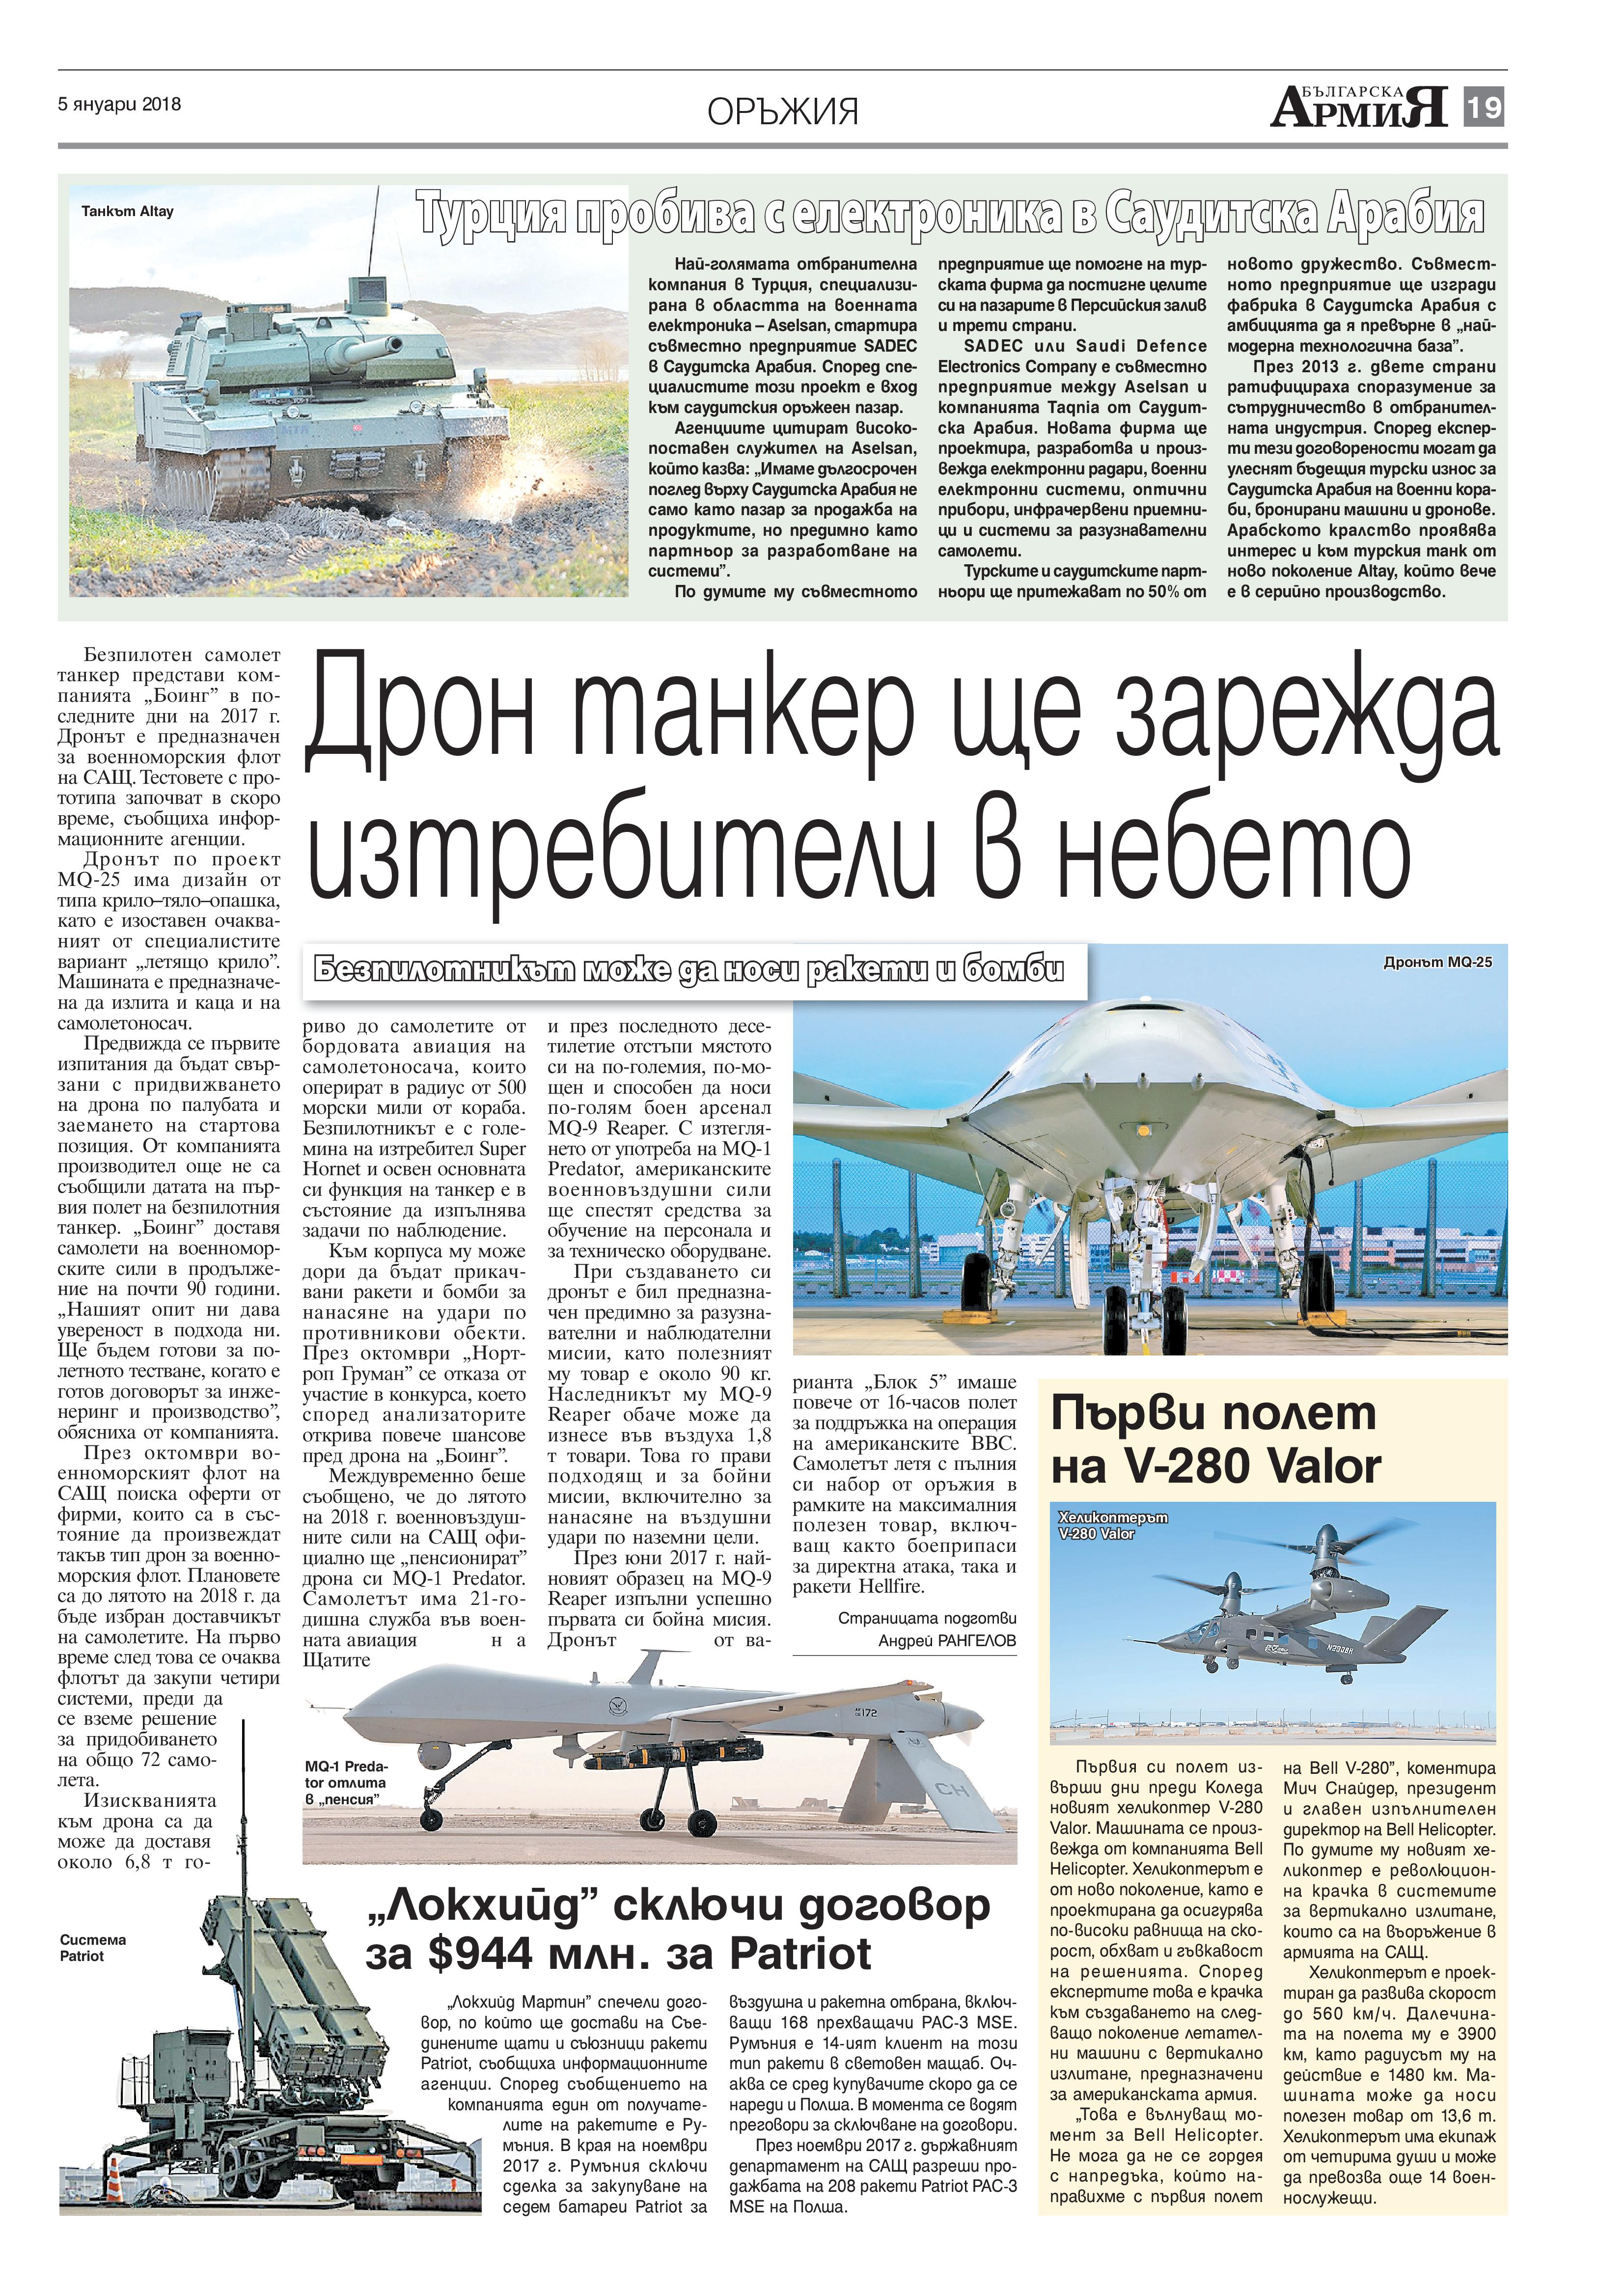 http://armymedia.bg/wp-content/uploads/2018/01/19.jpg